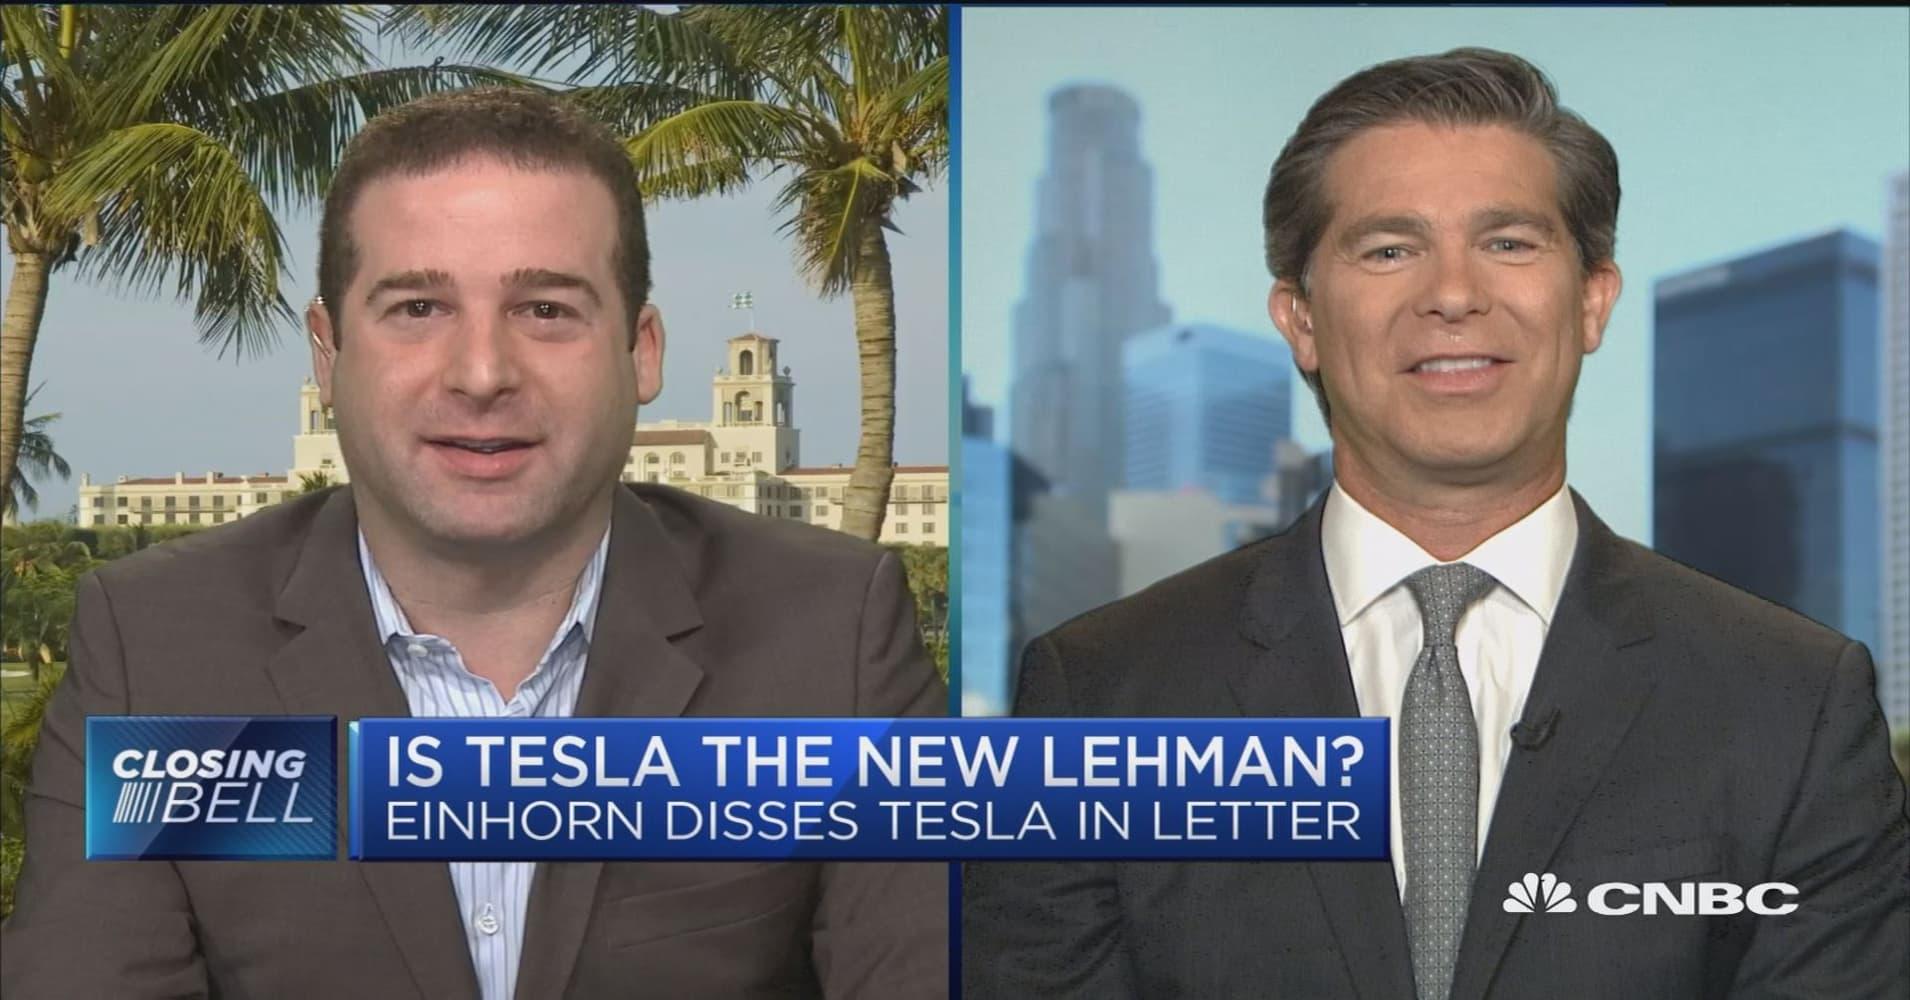 Tesla increasingly resembles Lehman Brothers 2